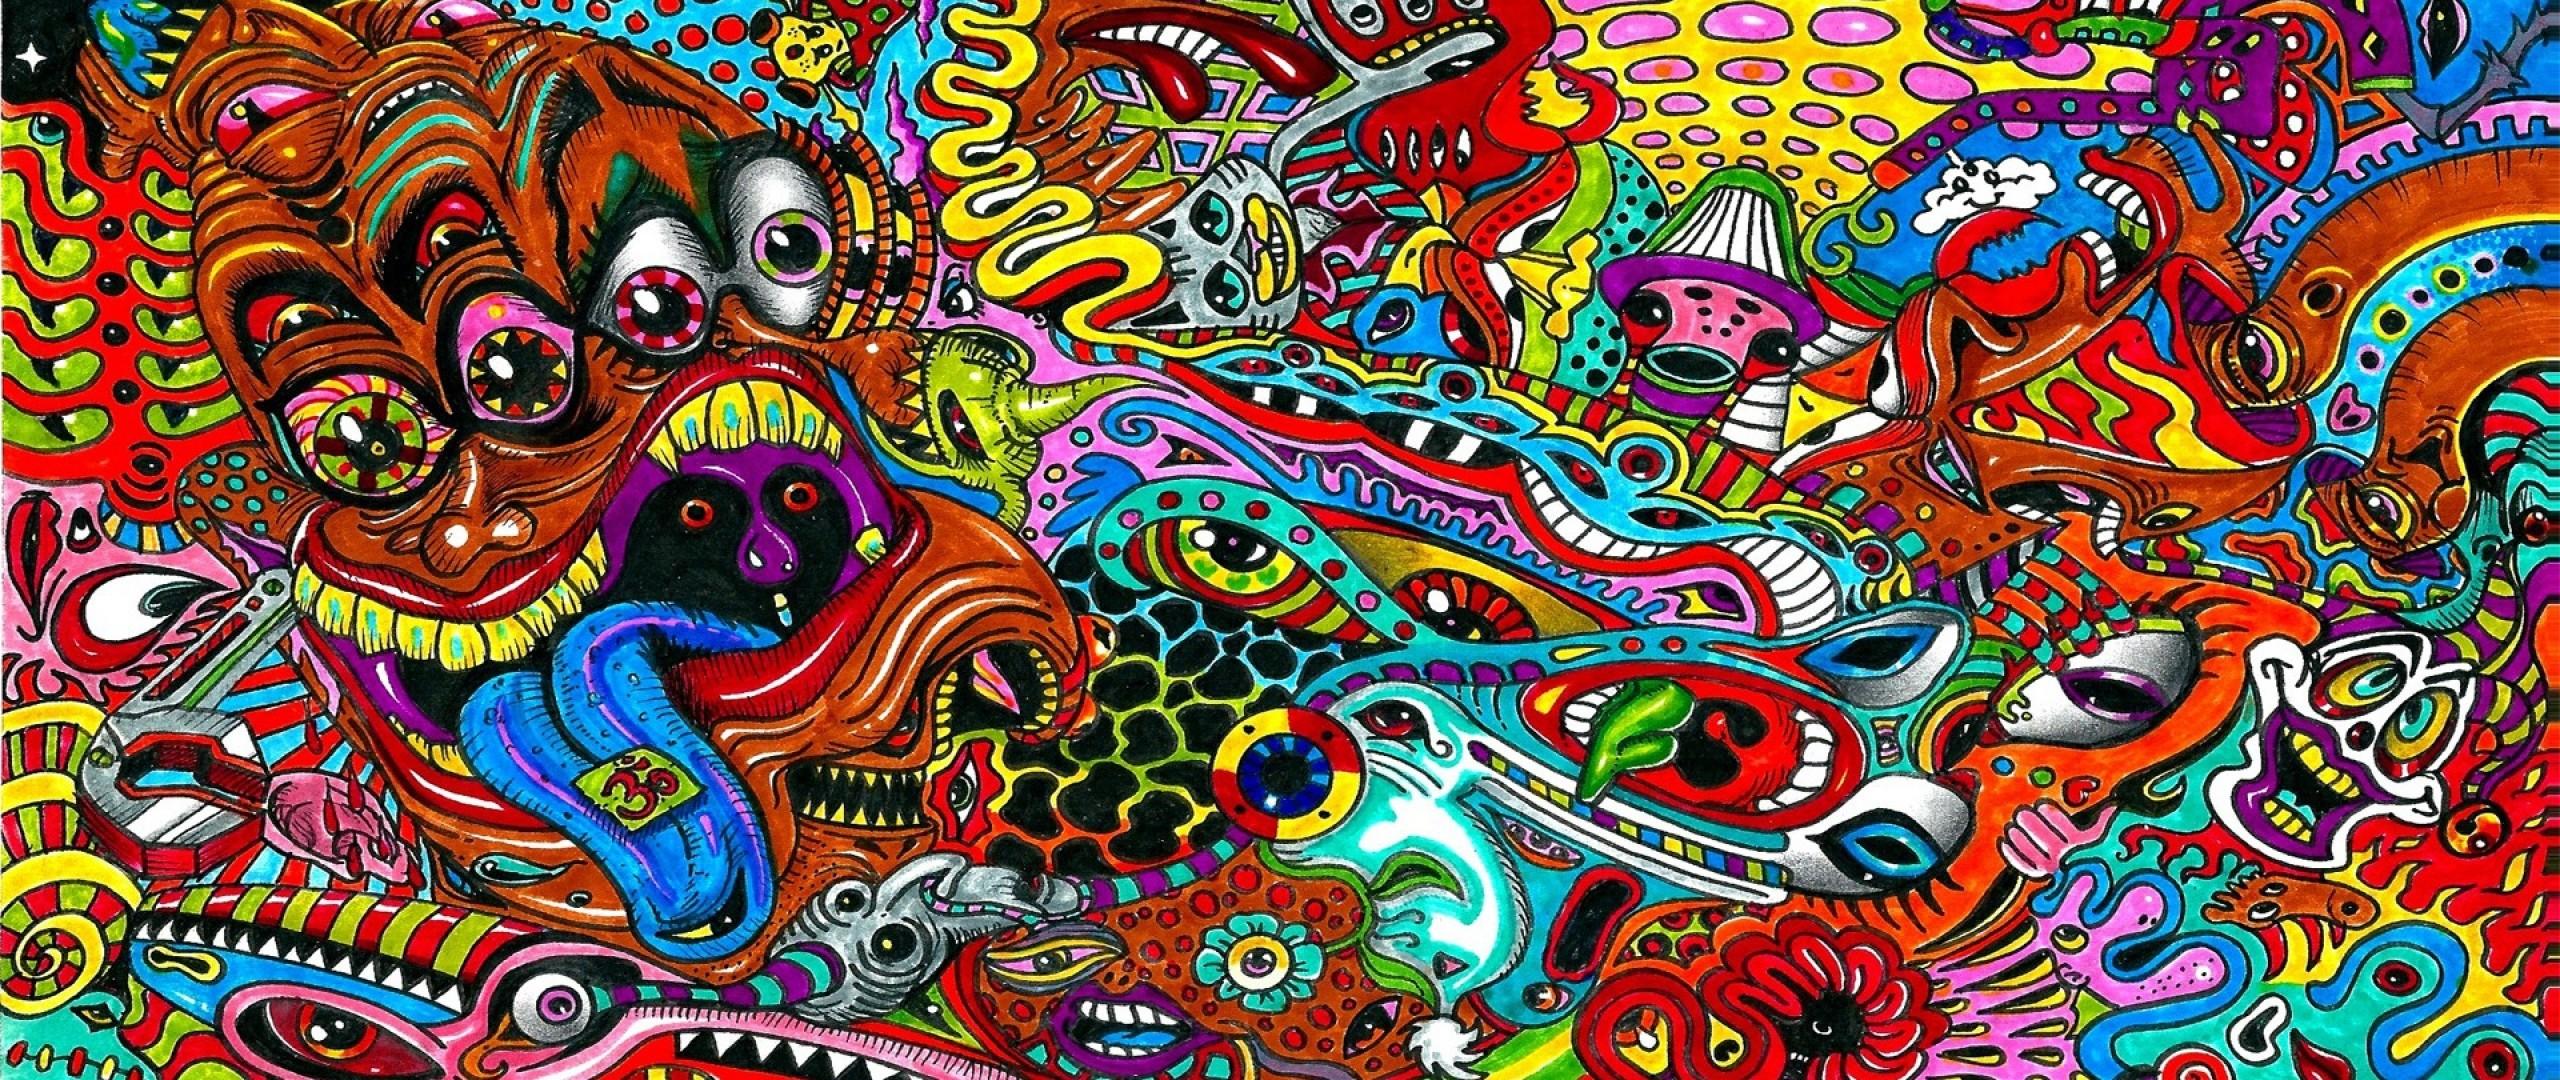 Trippy Wallpapers Hd: Psychedelic Desktop Wallpaper HD (68+ Images